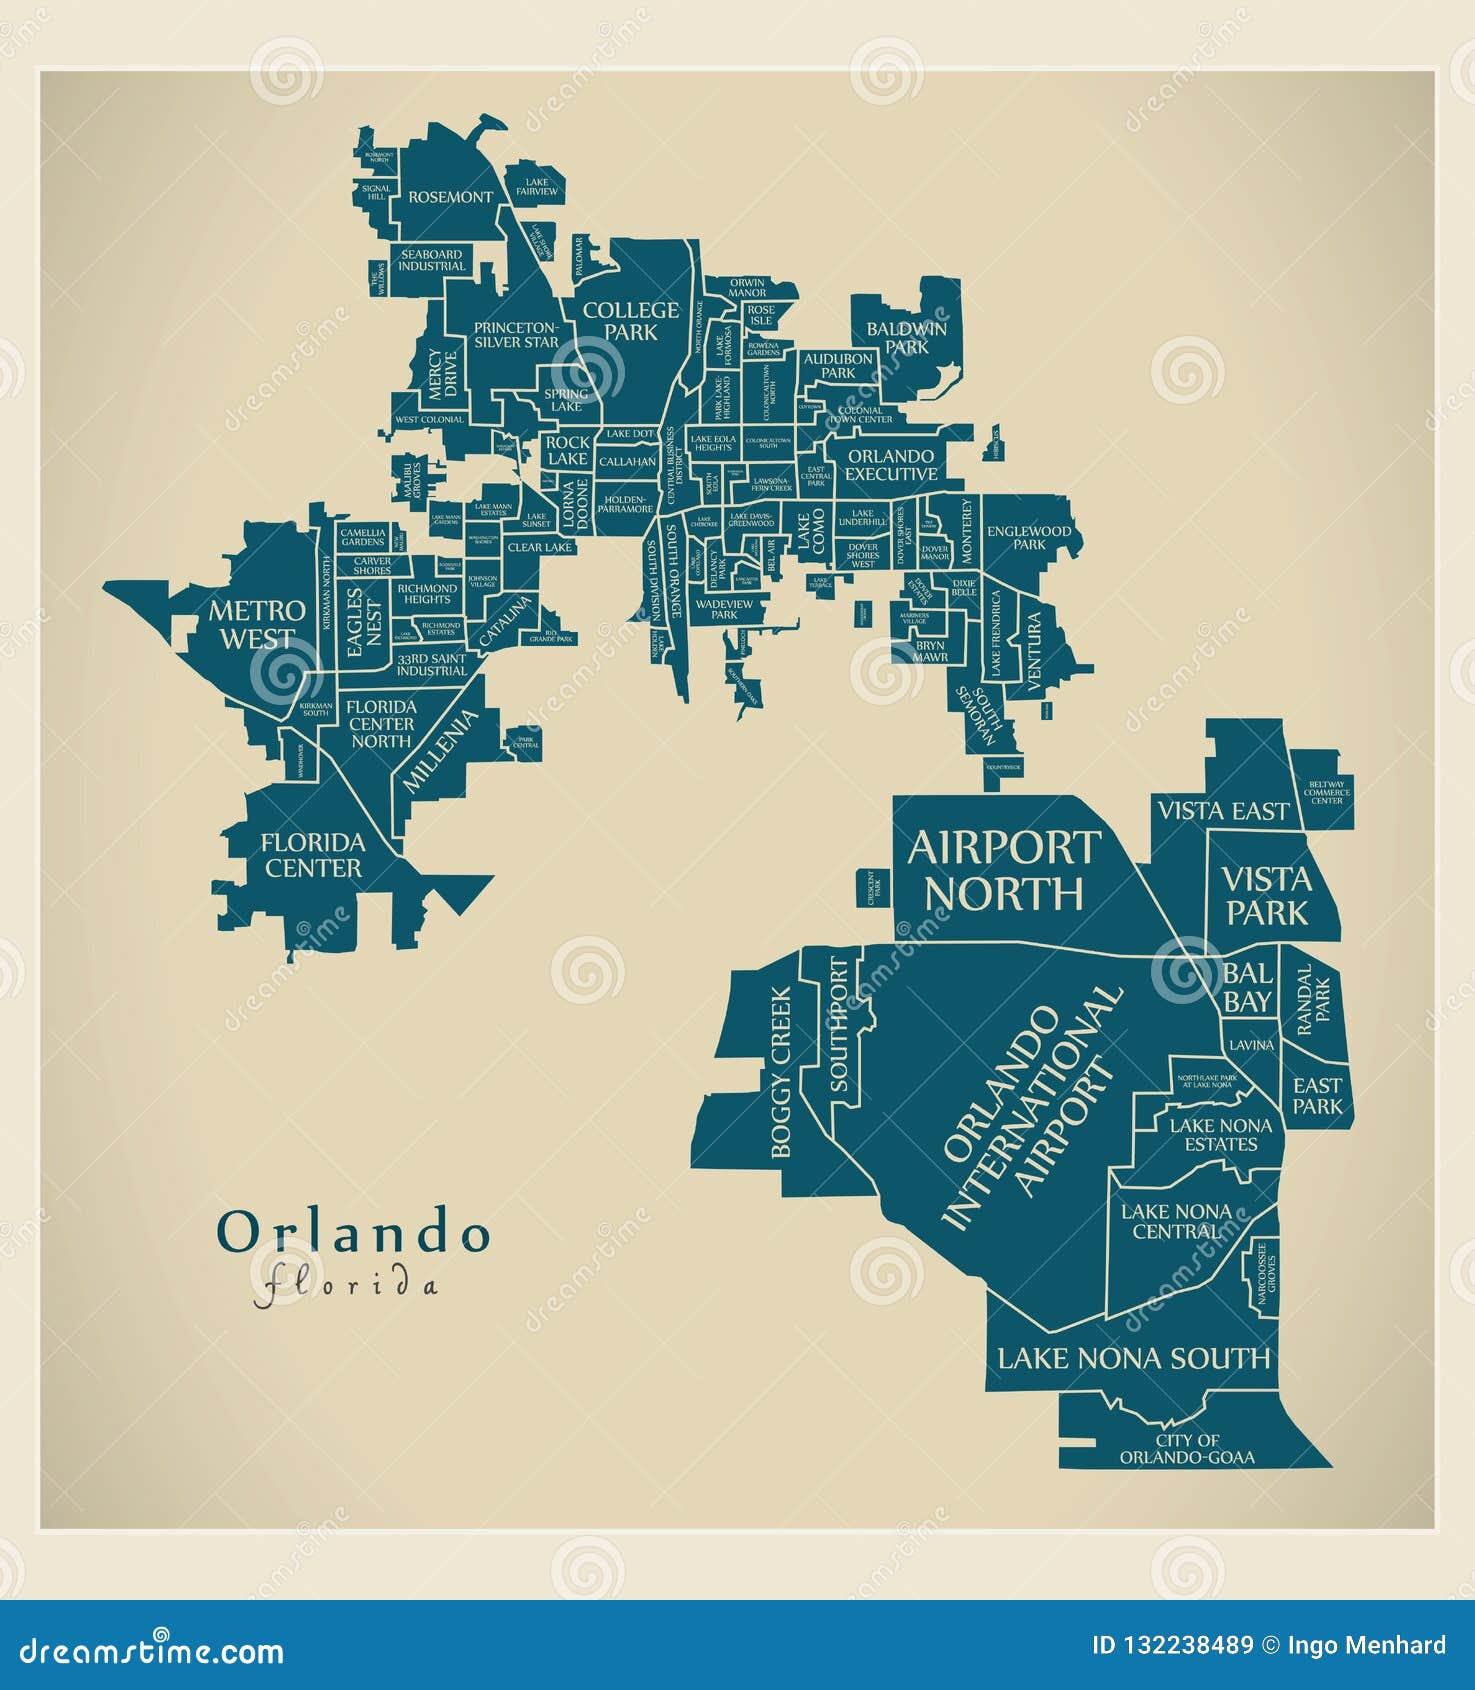 Map Florida City Names.Modern City Map Orlando Florida City Of The Usa With Neighborh